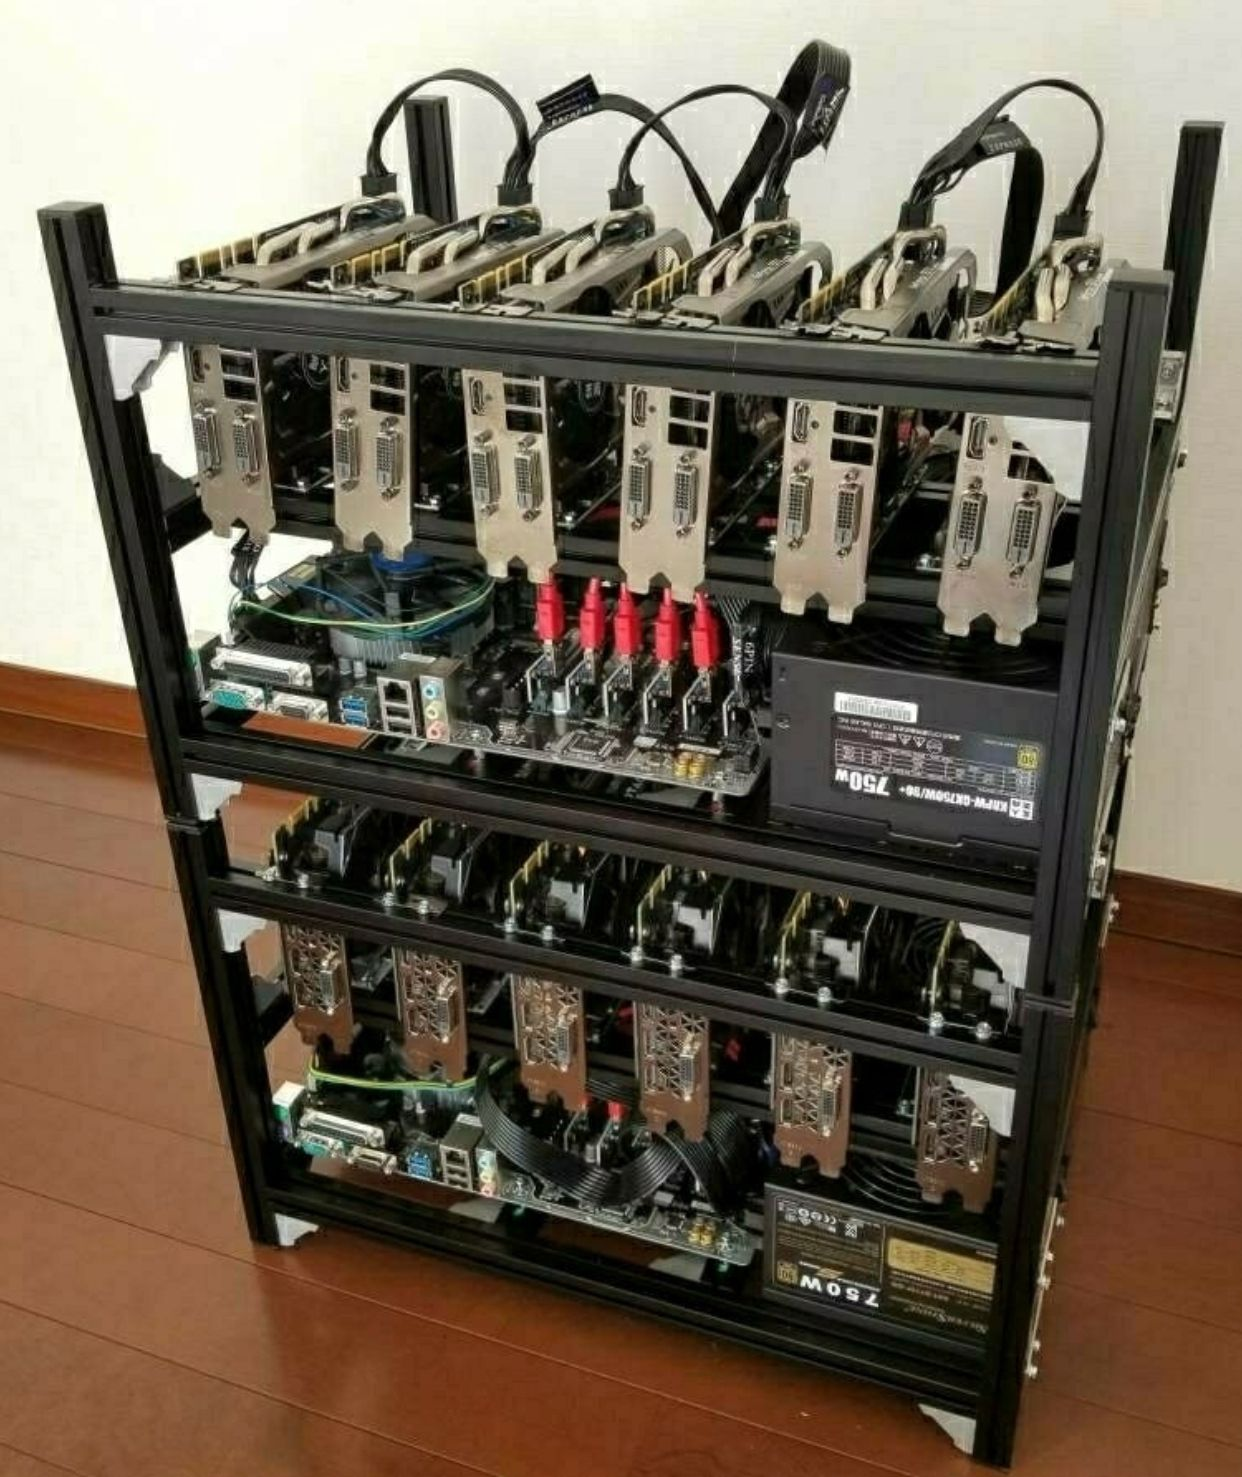 Pin by Ariya Pramudiya on BitCoin | Ethereum mining ...